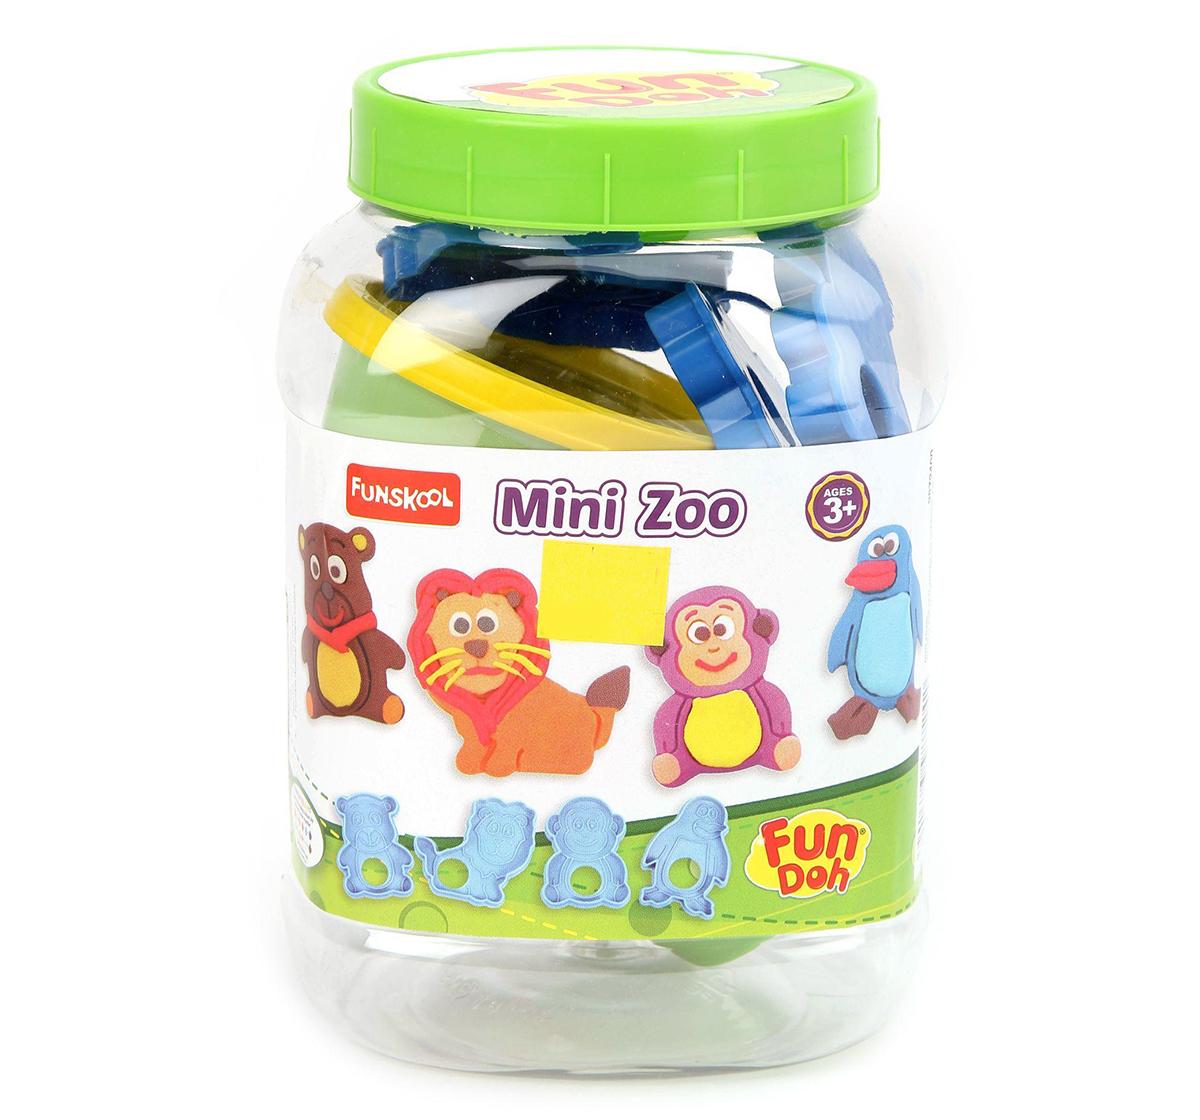 Fun-Dough | Fun Dough Mini Zoo Clay & Dough for Kids Age 3Y+